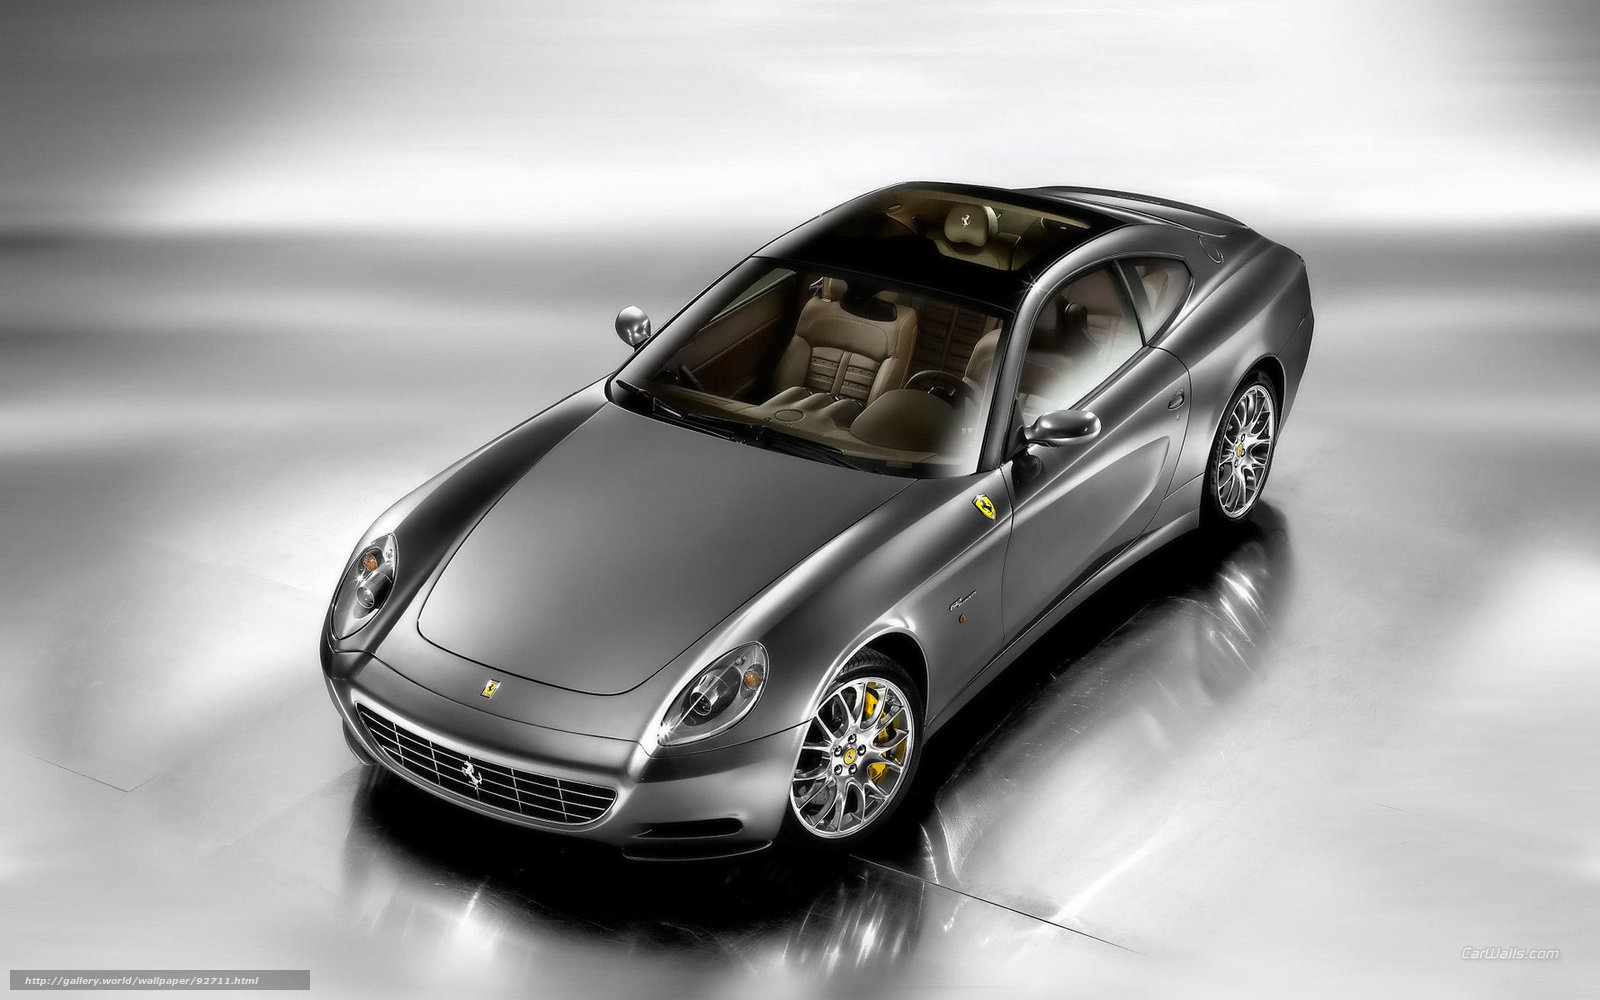 Download wallpaper Ferrari,  90210,  auto,  Machines free desktop wallpaper in the resolution 1920x1200 — picture №92711